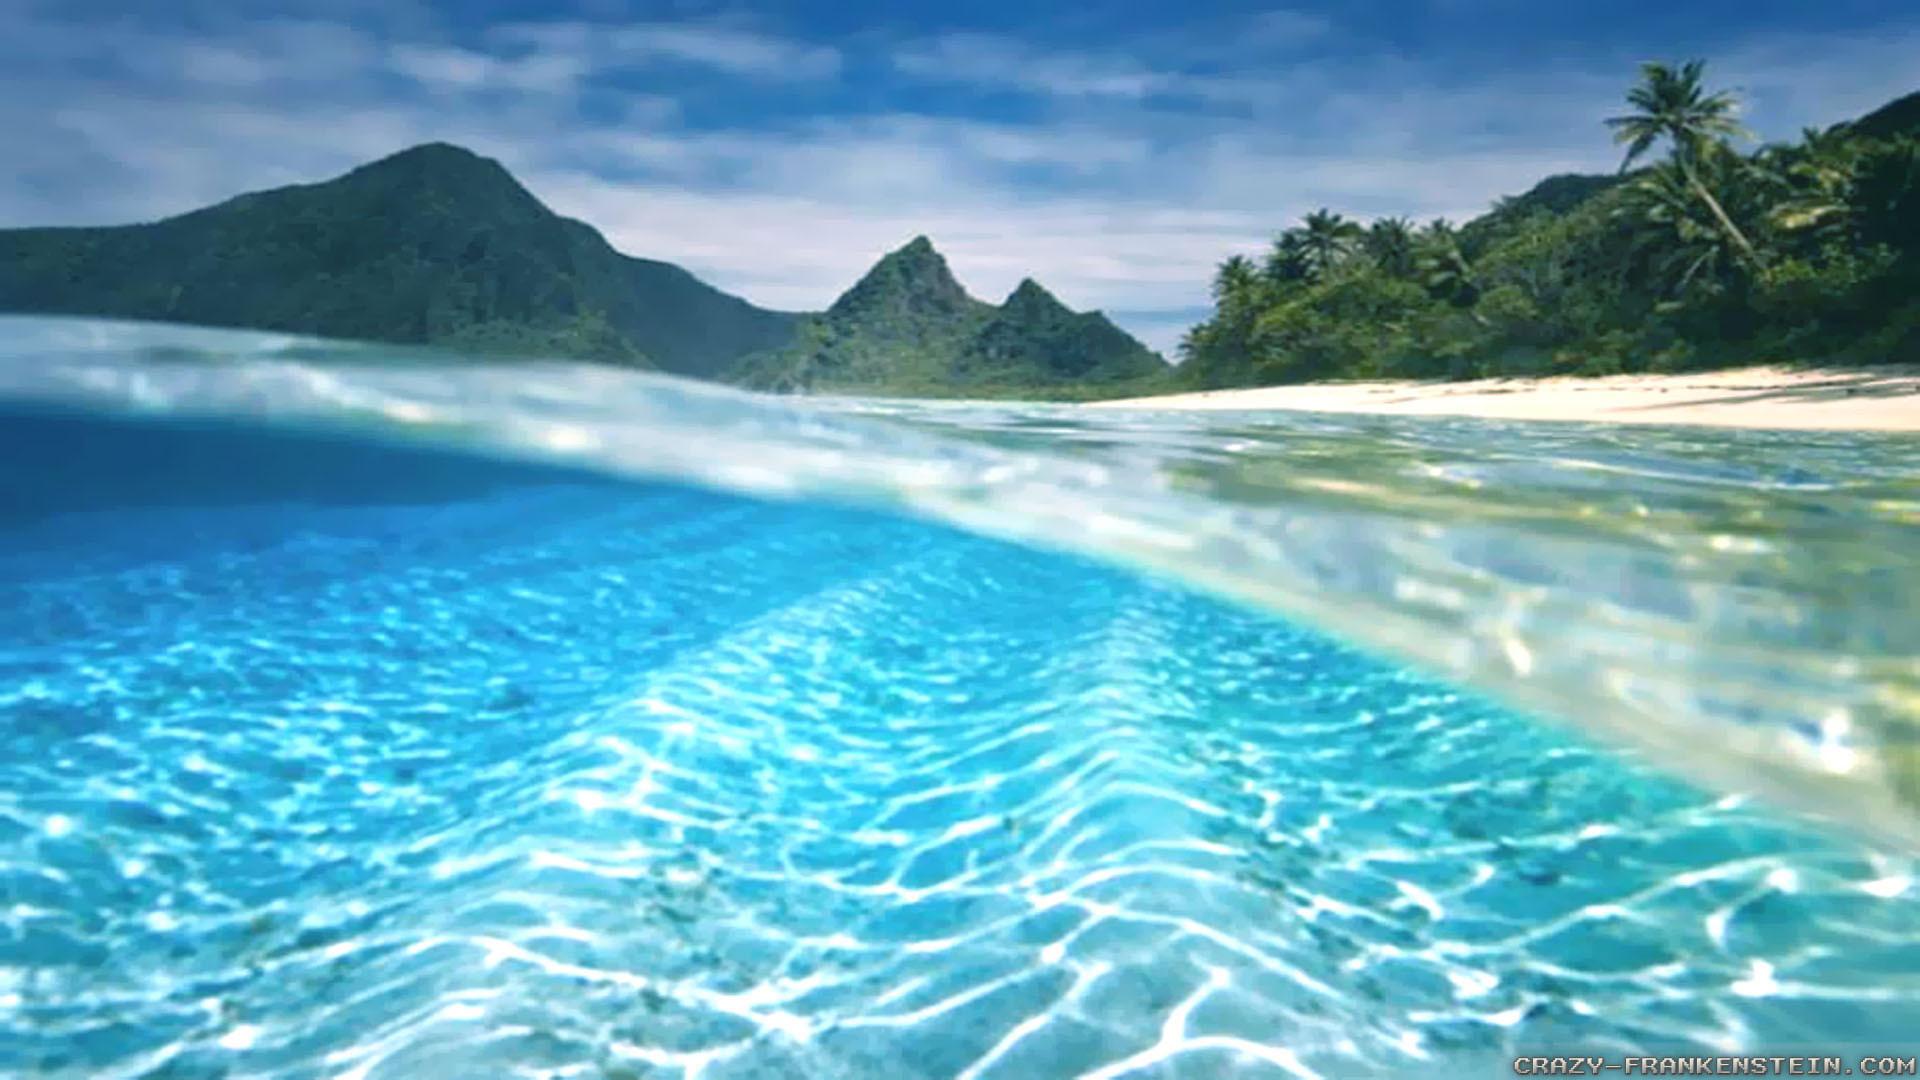 Niagara Falls Hd 1080p Wallpapers Samoan Backgrounds 49 Images